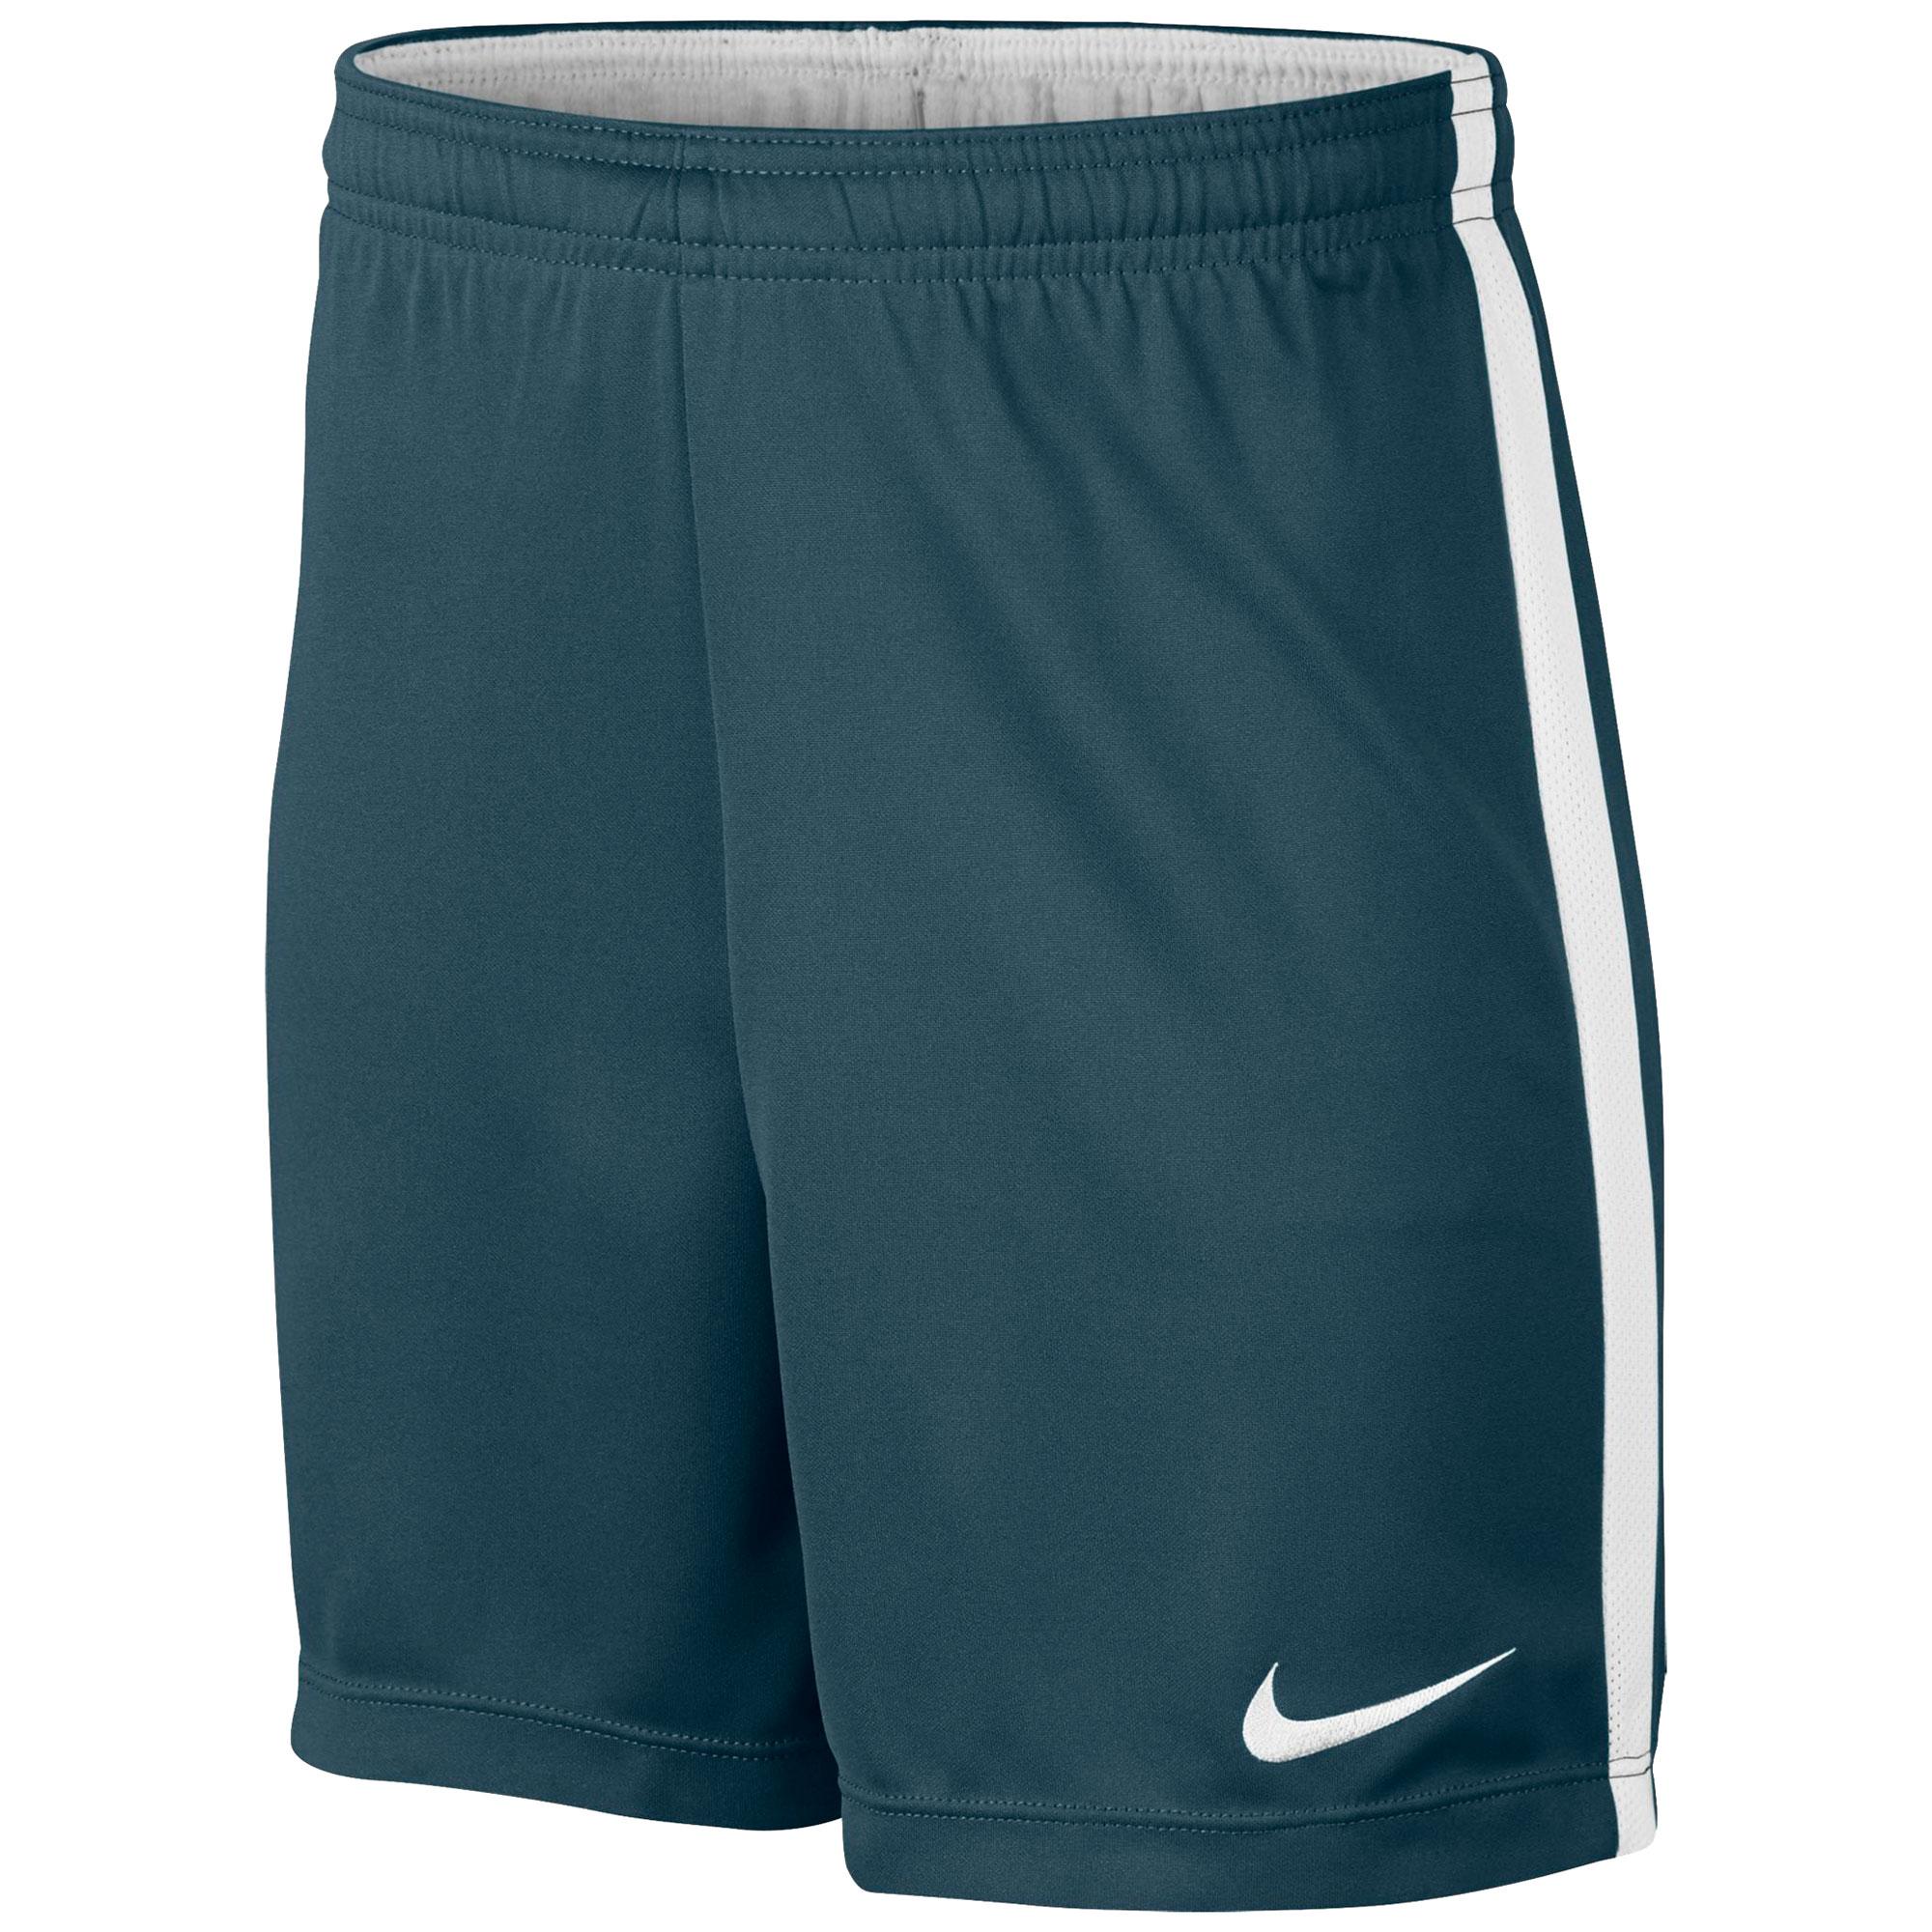 Nike Dry Academy Shorts - Space Blue/White/White/White - Kids